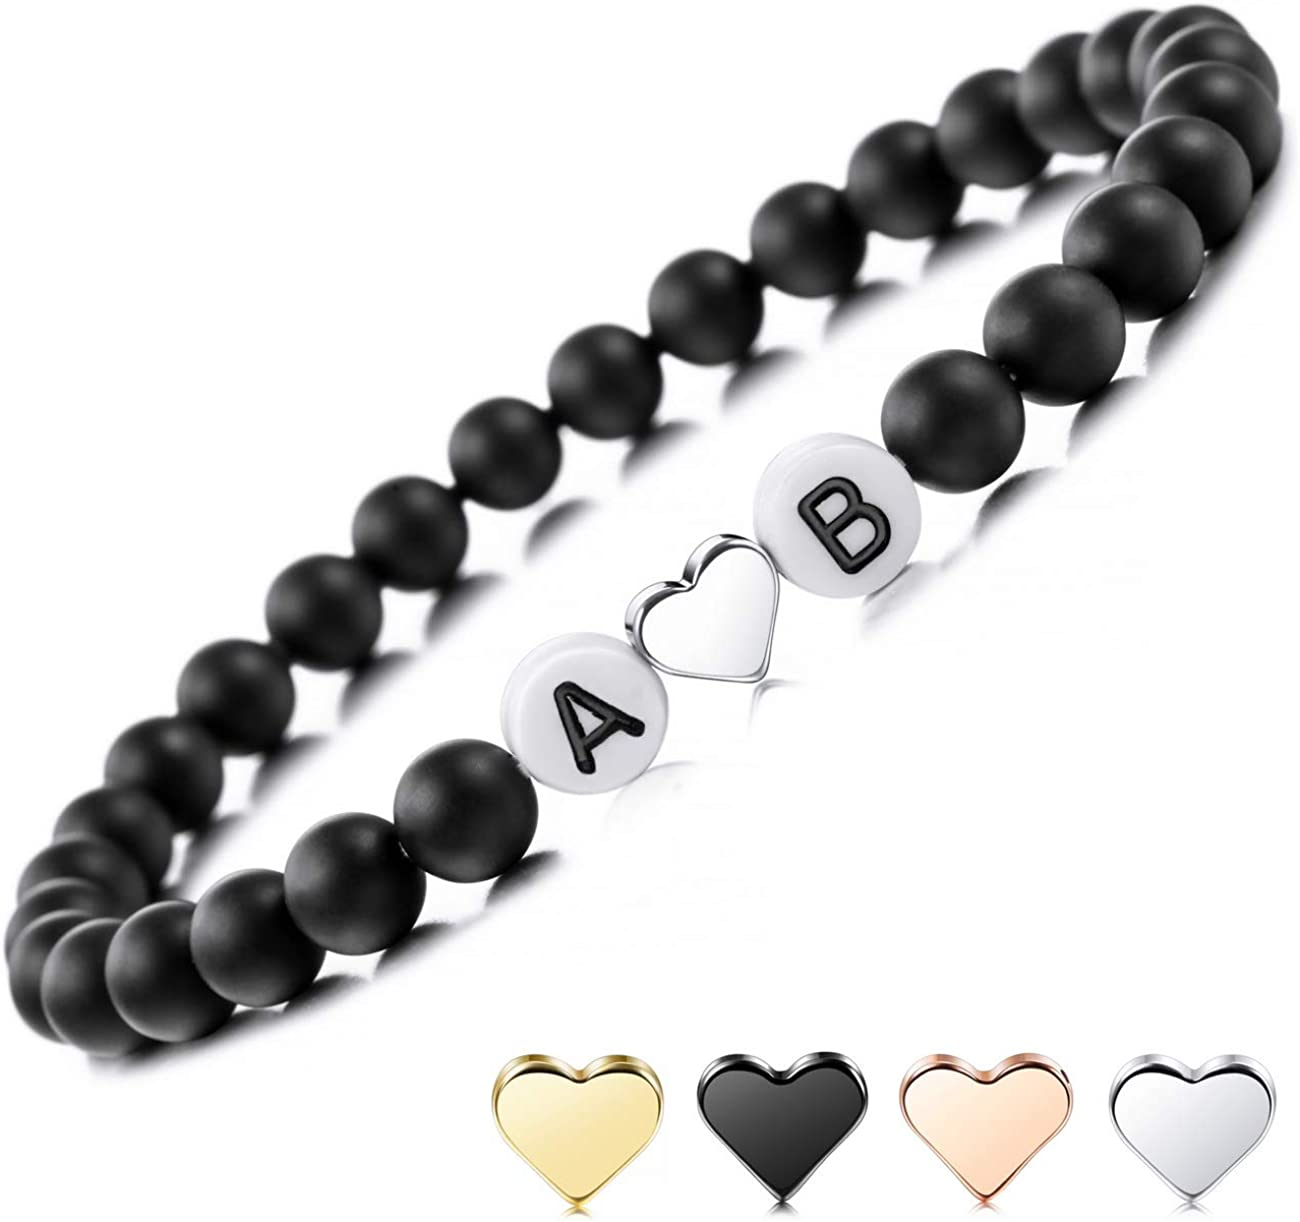 agate stone bridesmaid gift wedding gift Custom Wedding brand name